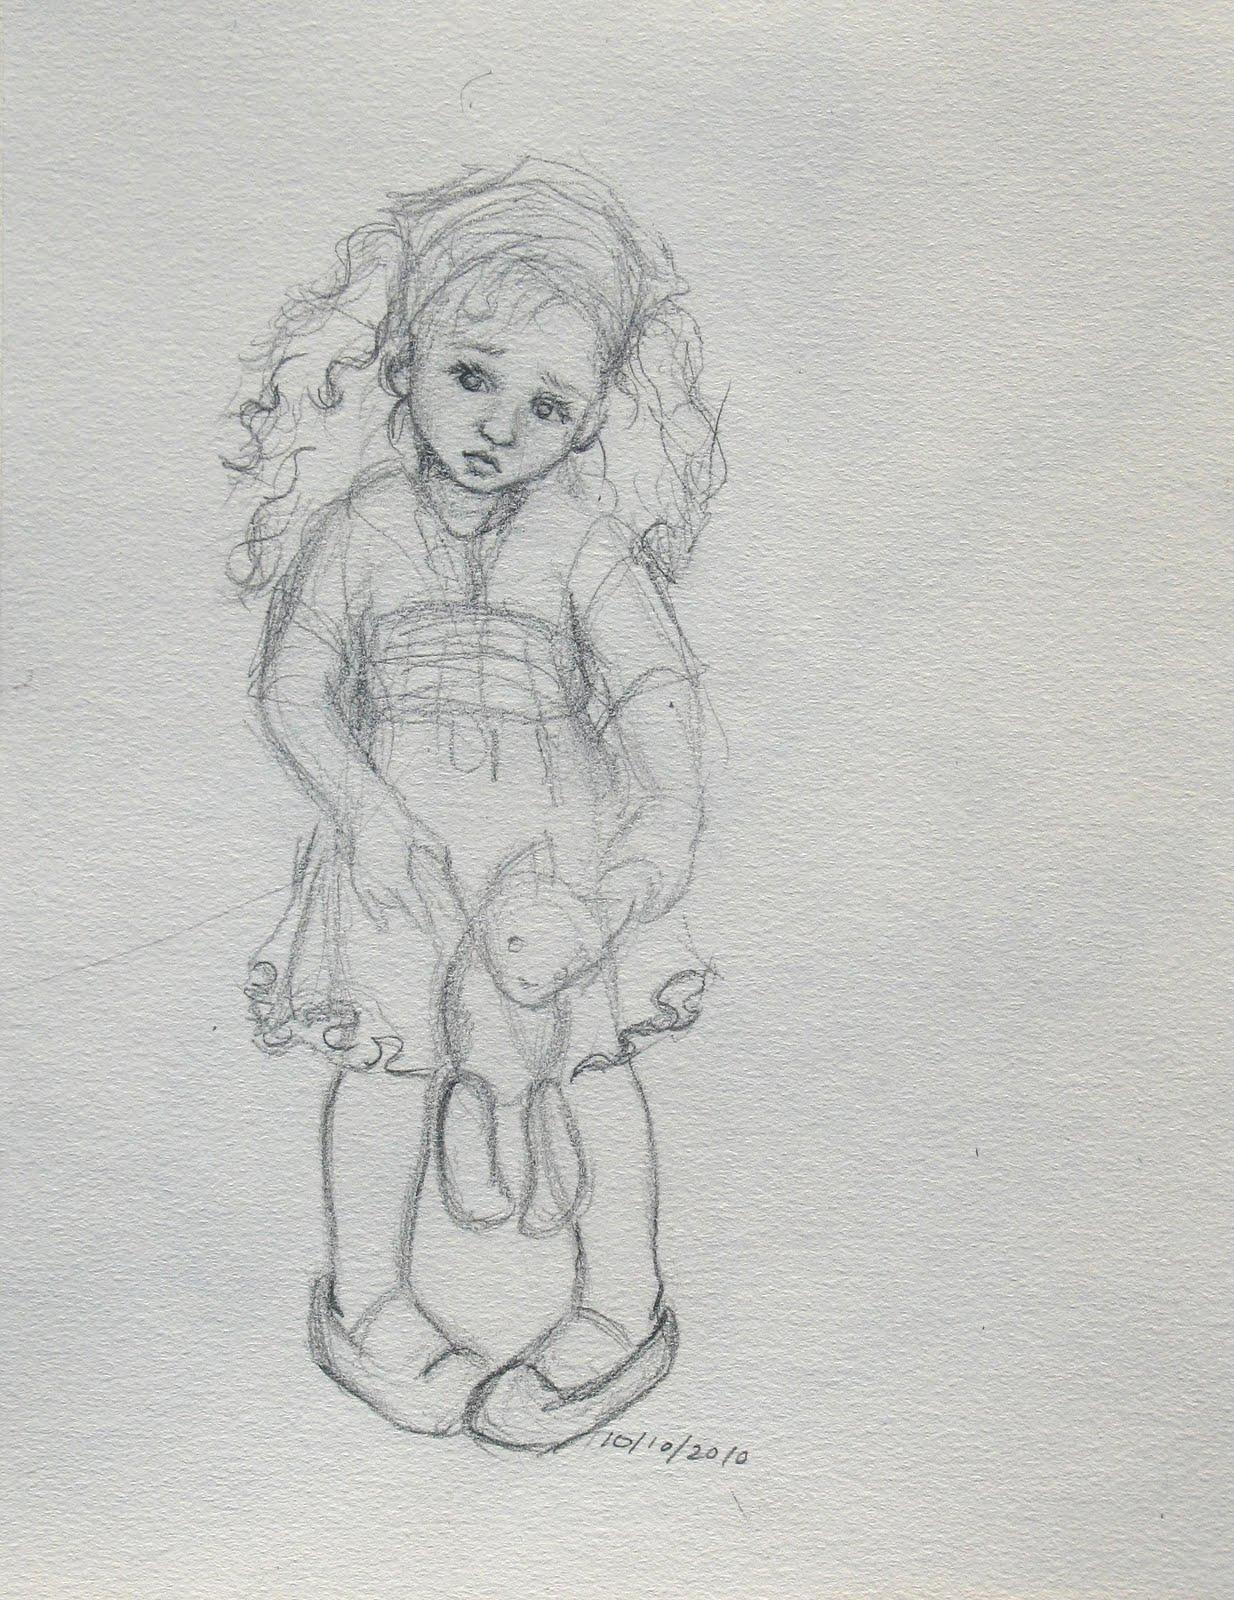 Sad Little Girl Sketches | www.pixshark.com - Images ...